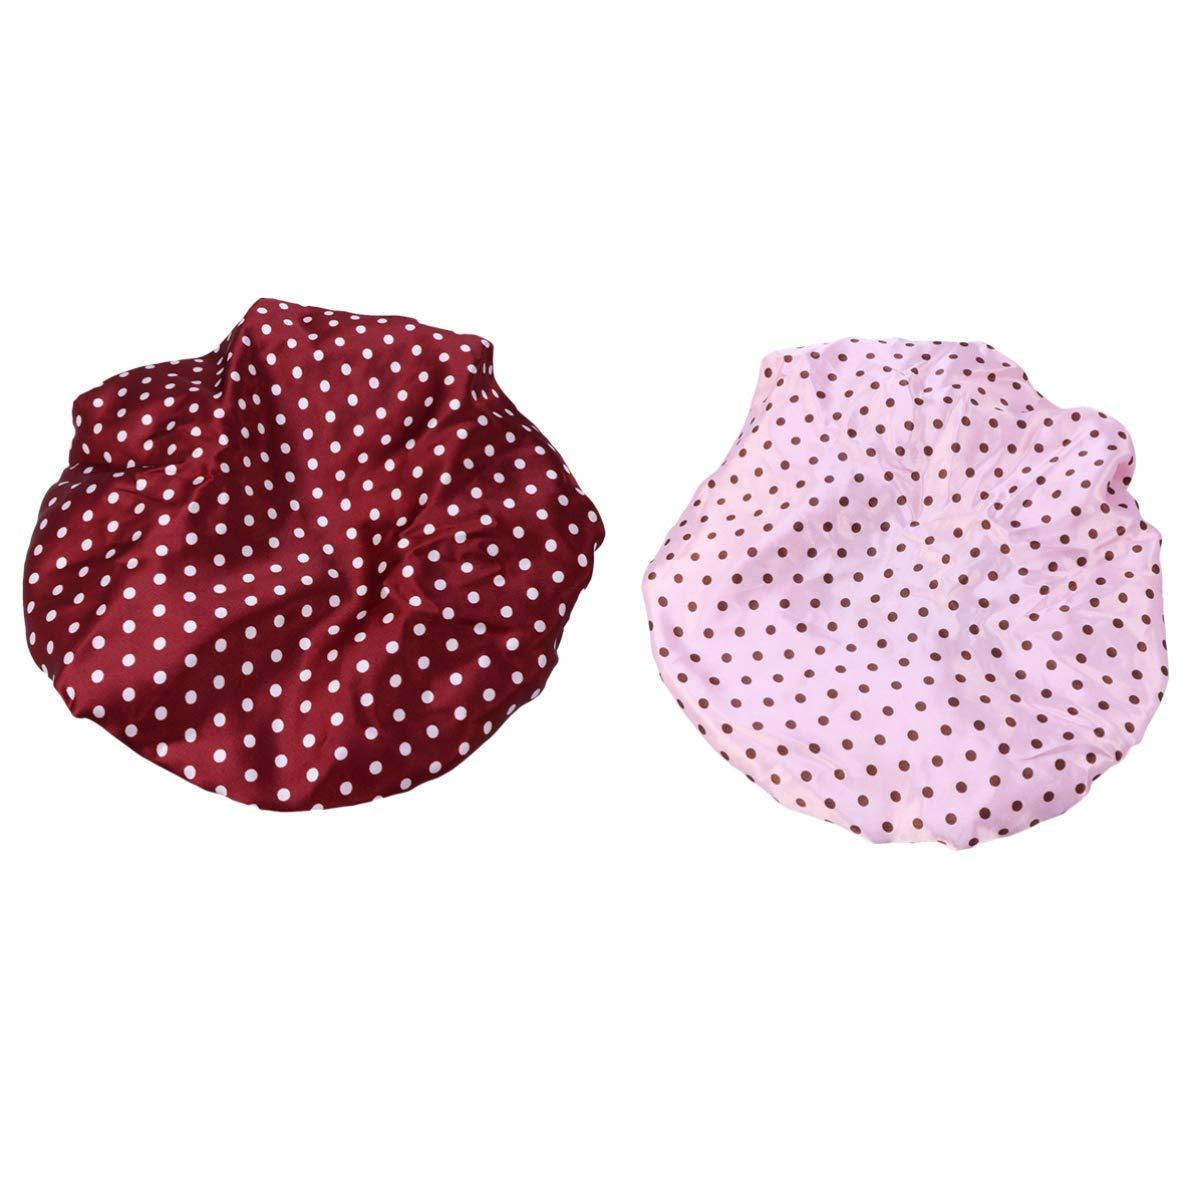 SUPVOX 2pcs Shower Caps Dot Pattern Elastic Waterproof Reusable Bathing Salon Hair Cap Heart Grass Pattern for Girl Woman